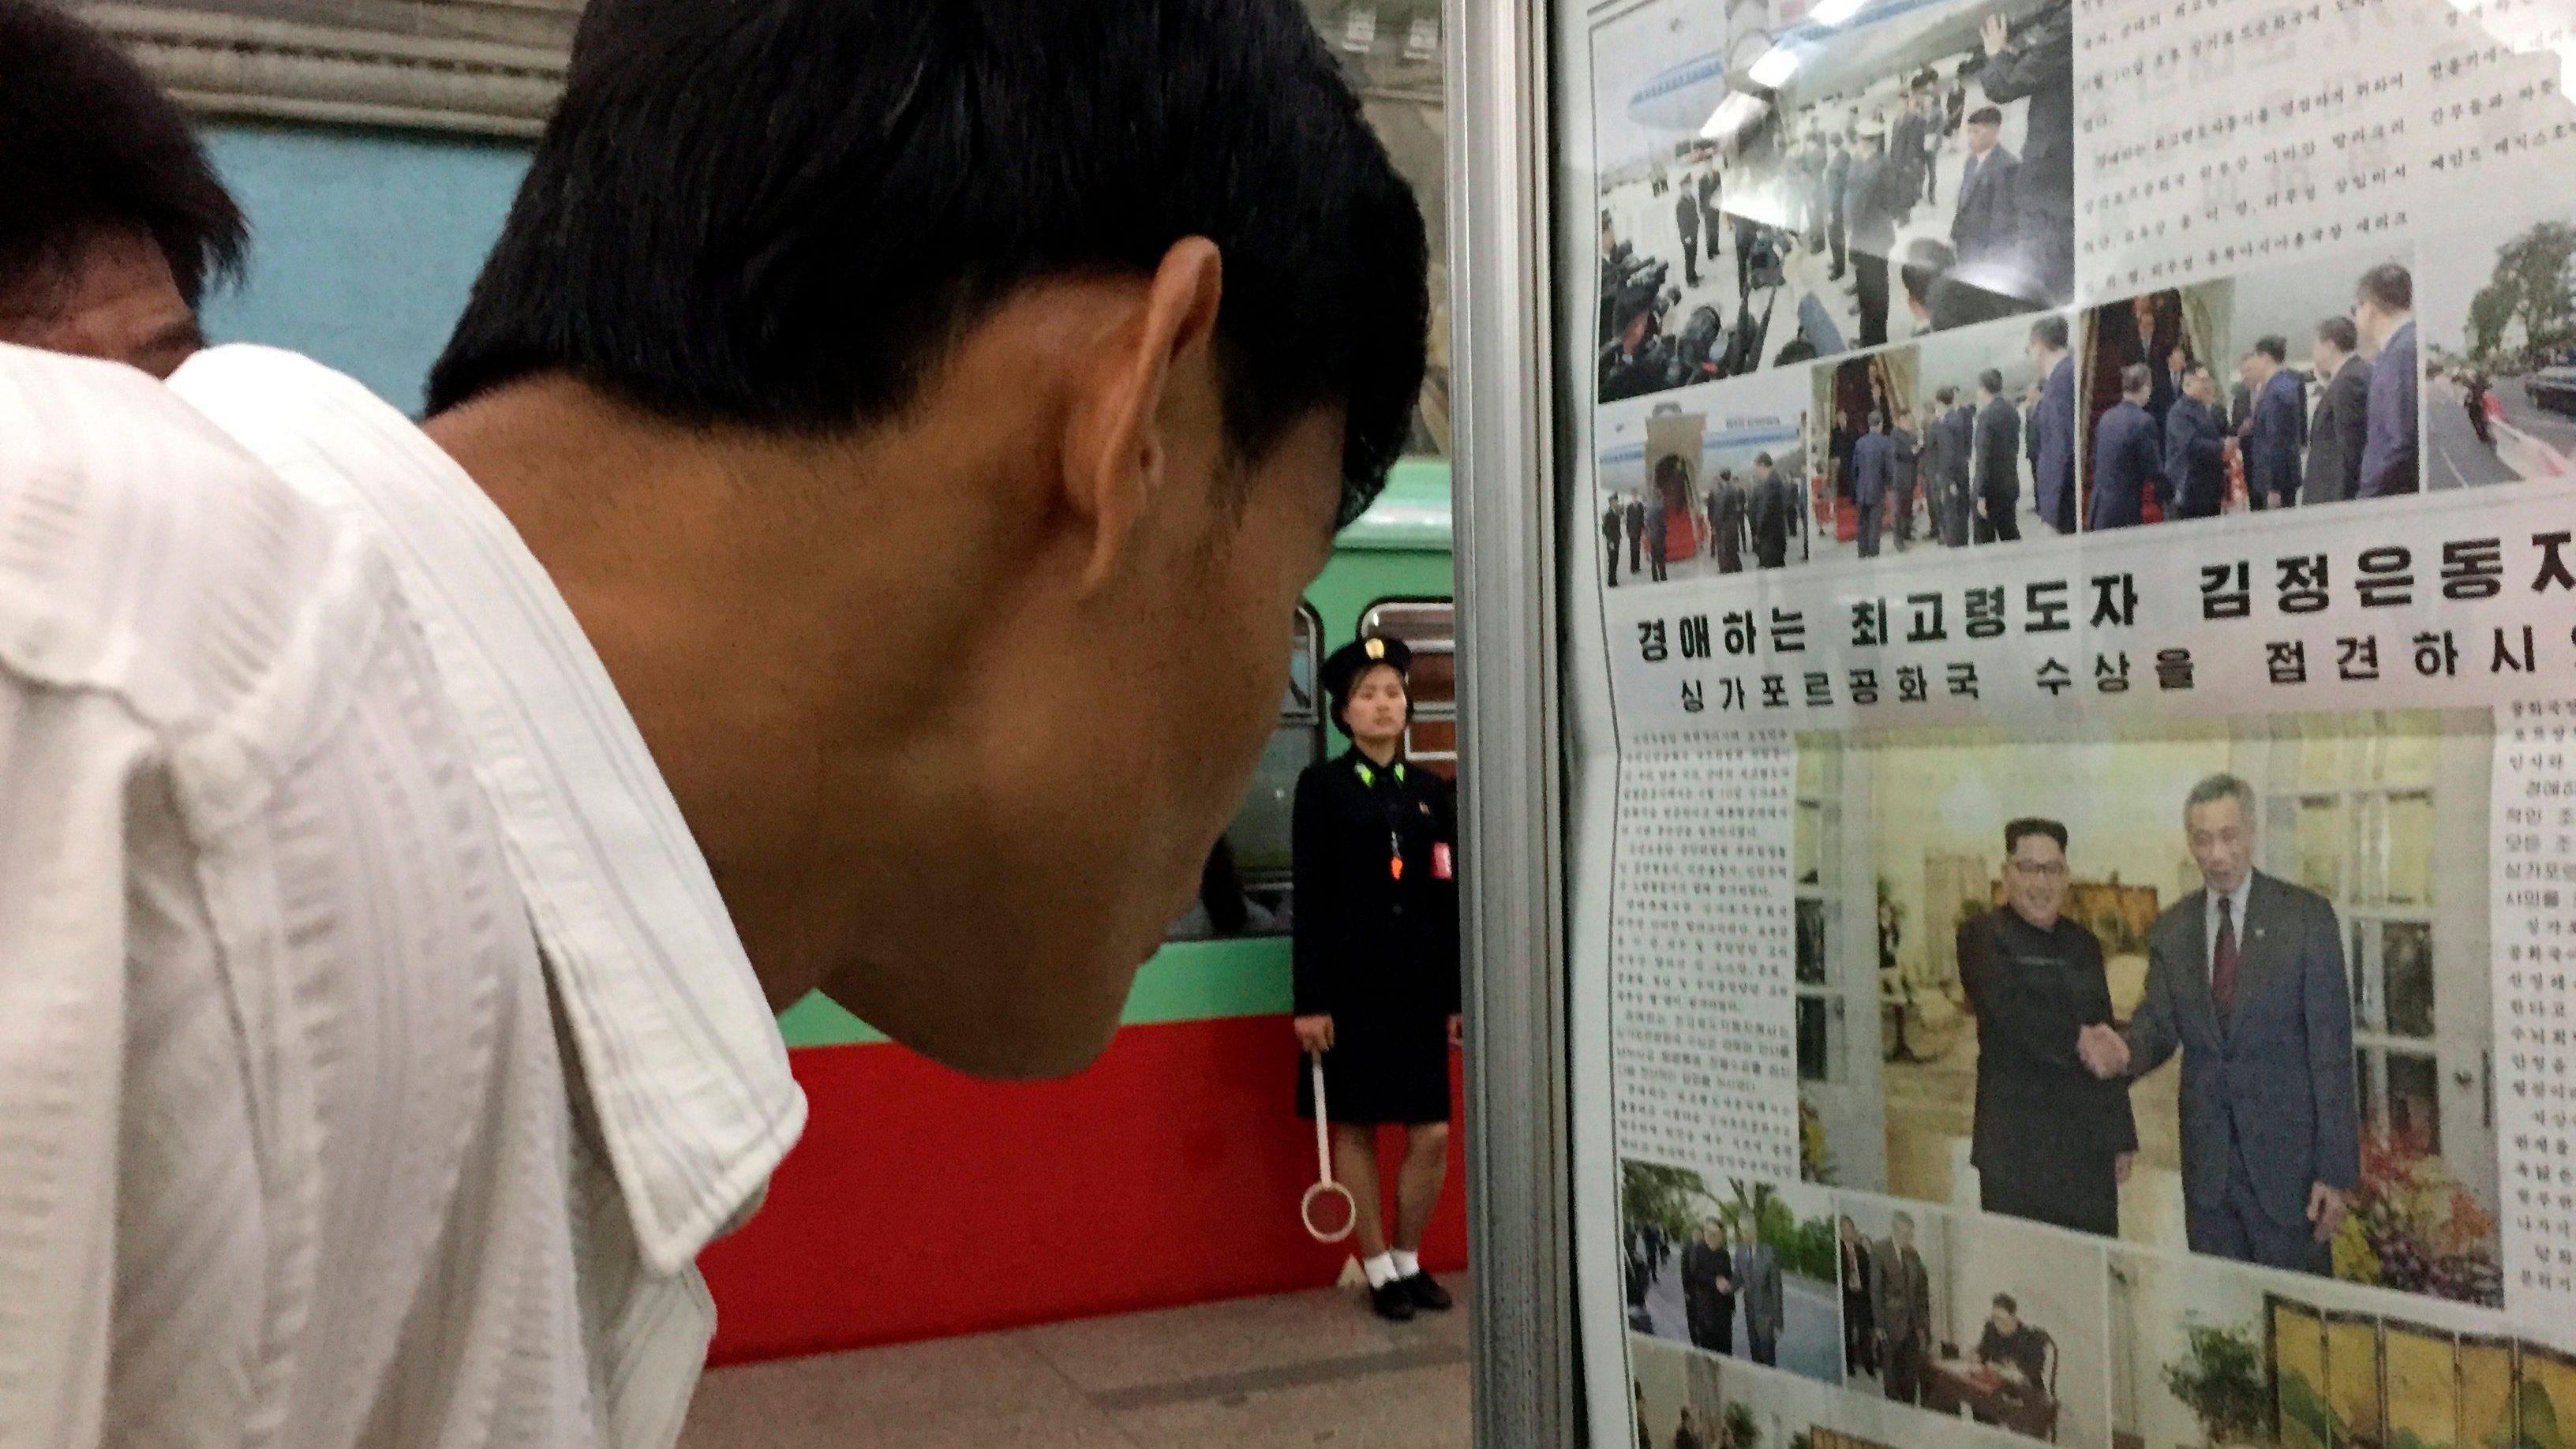 [Image: North-Korea-Trump-Kim-summit-newspaper-c...all&w=1600]